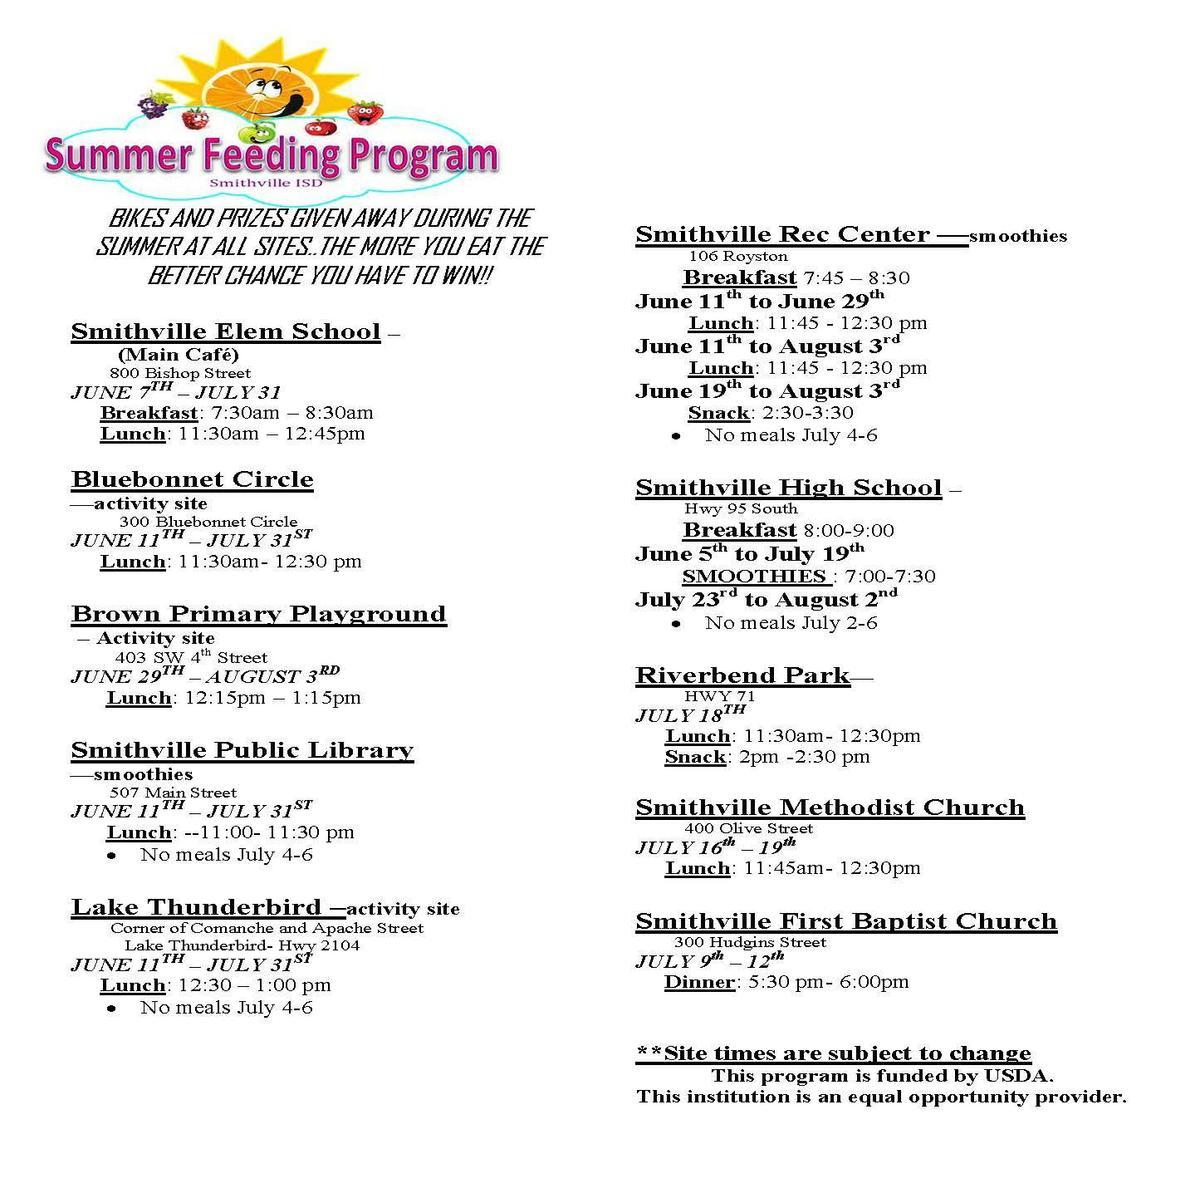 Summer Feeding Program Sites